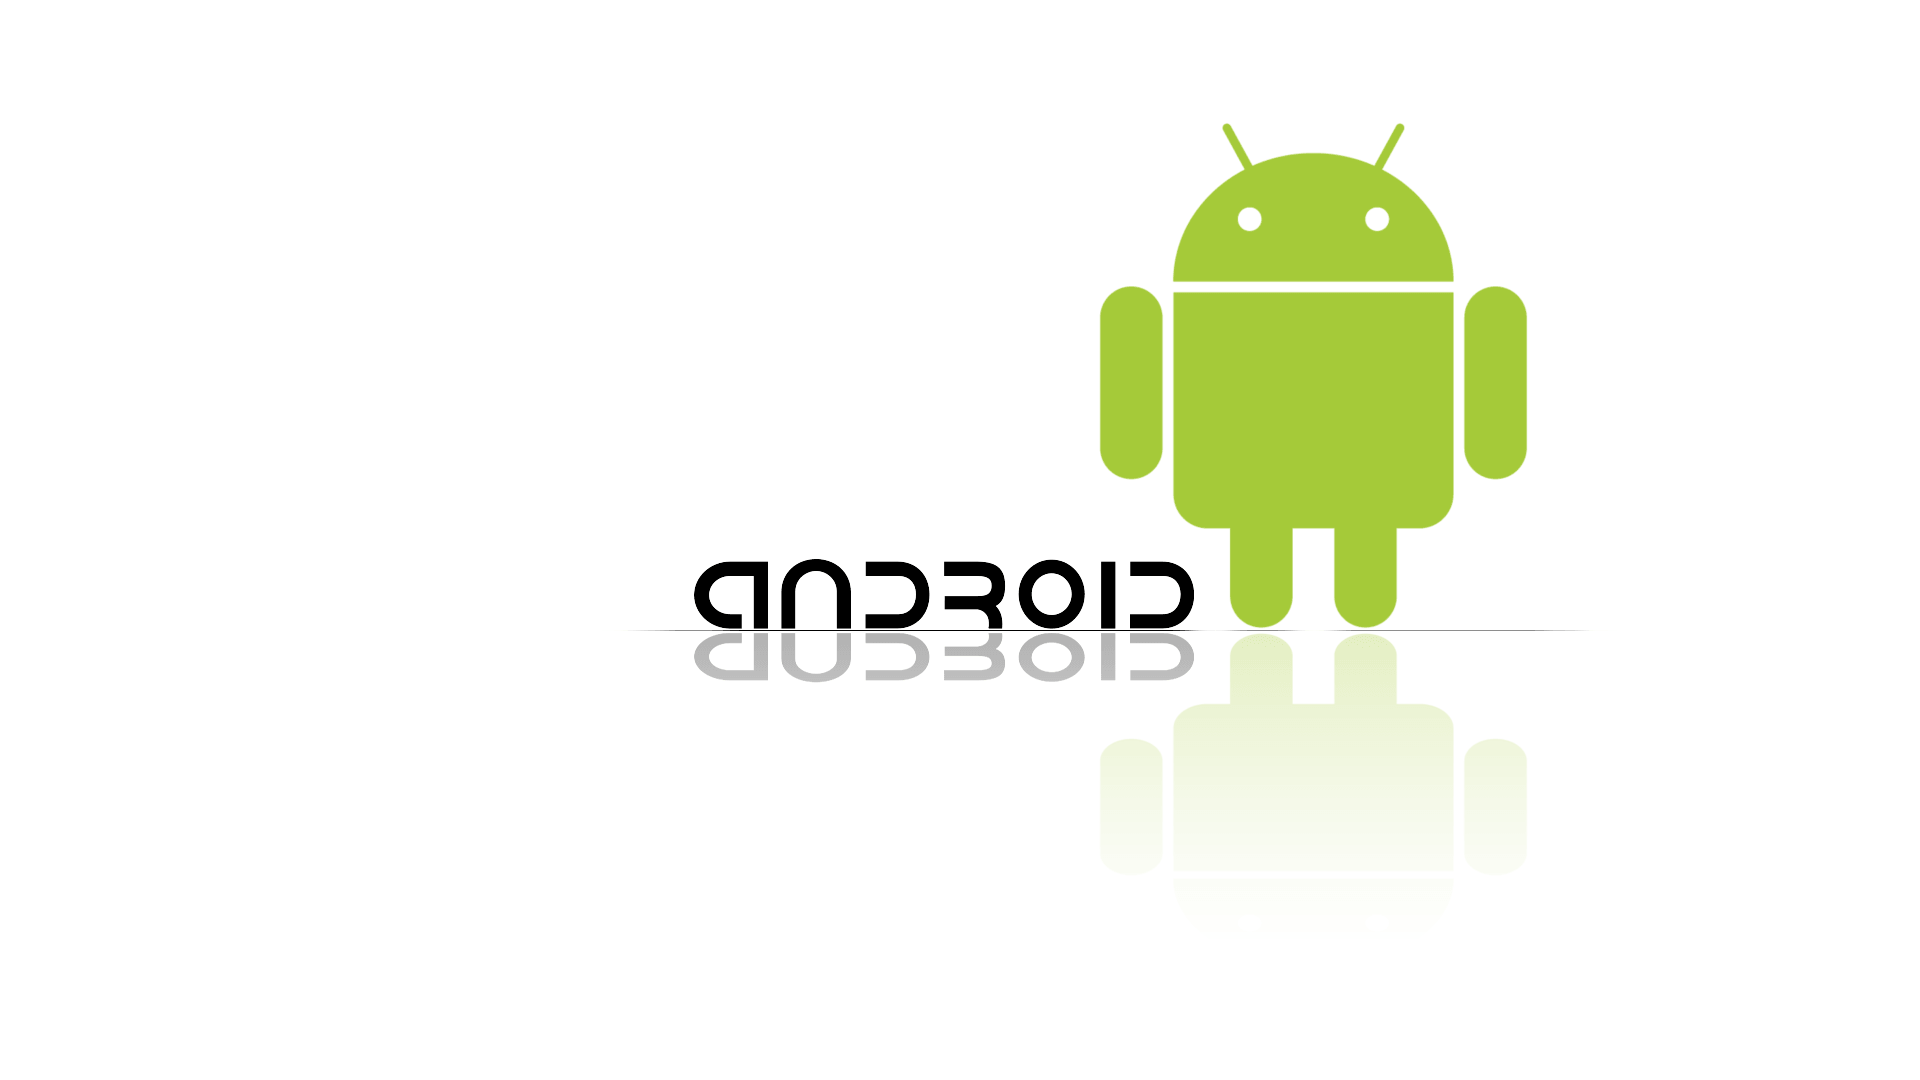 android programi nasil yapilir ?